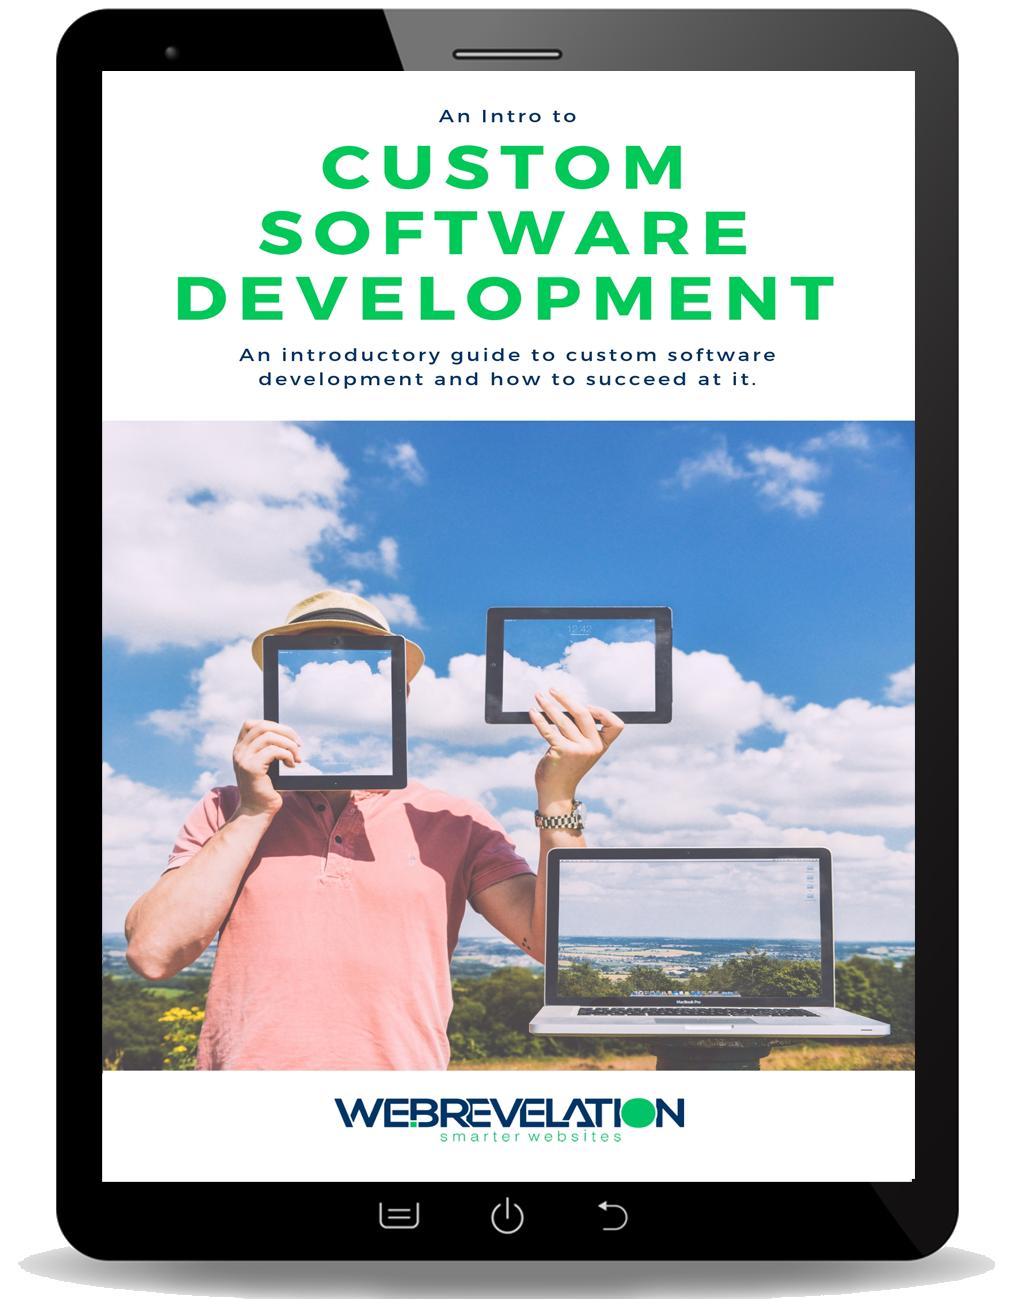 Free Ebook Intro to Custom Web Development Software